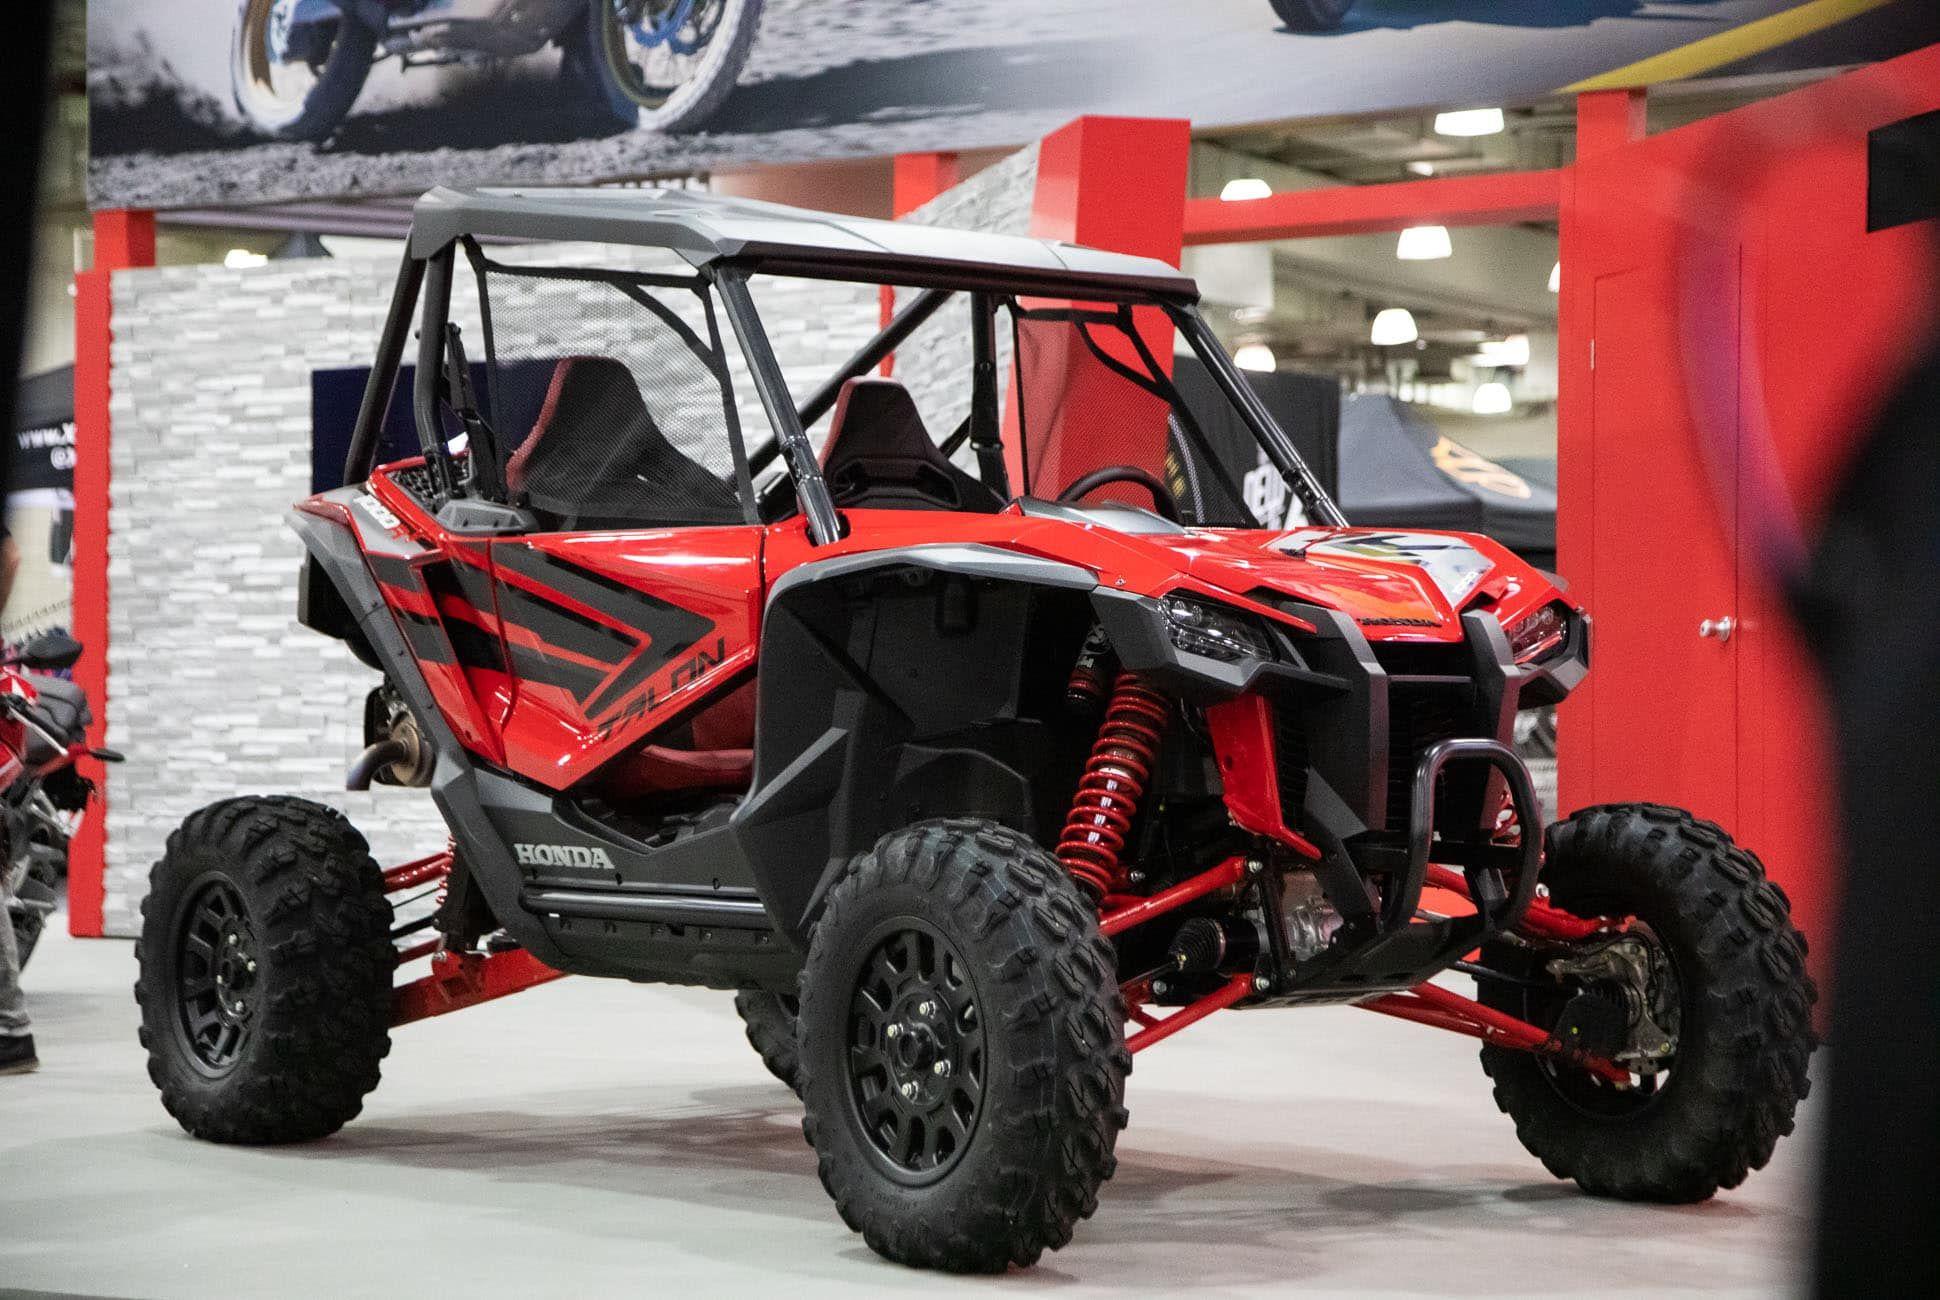 IMS 2018 Show Gear Patrol Honda Slide 05